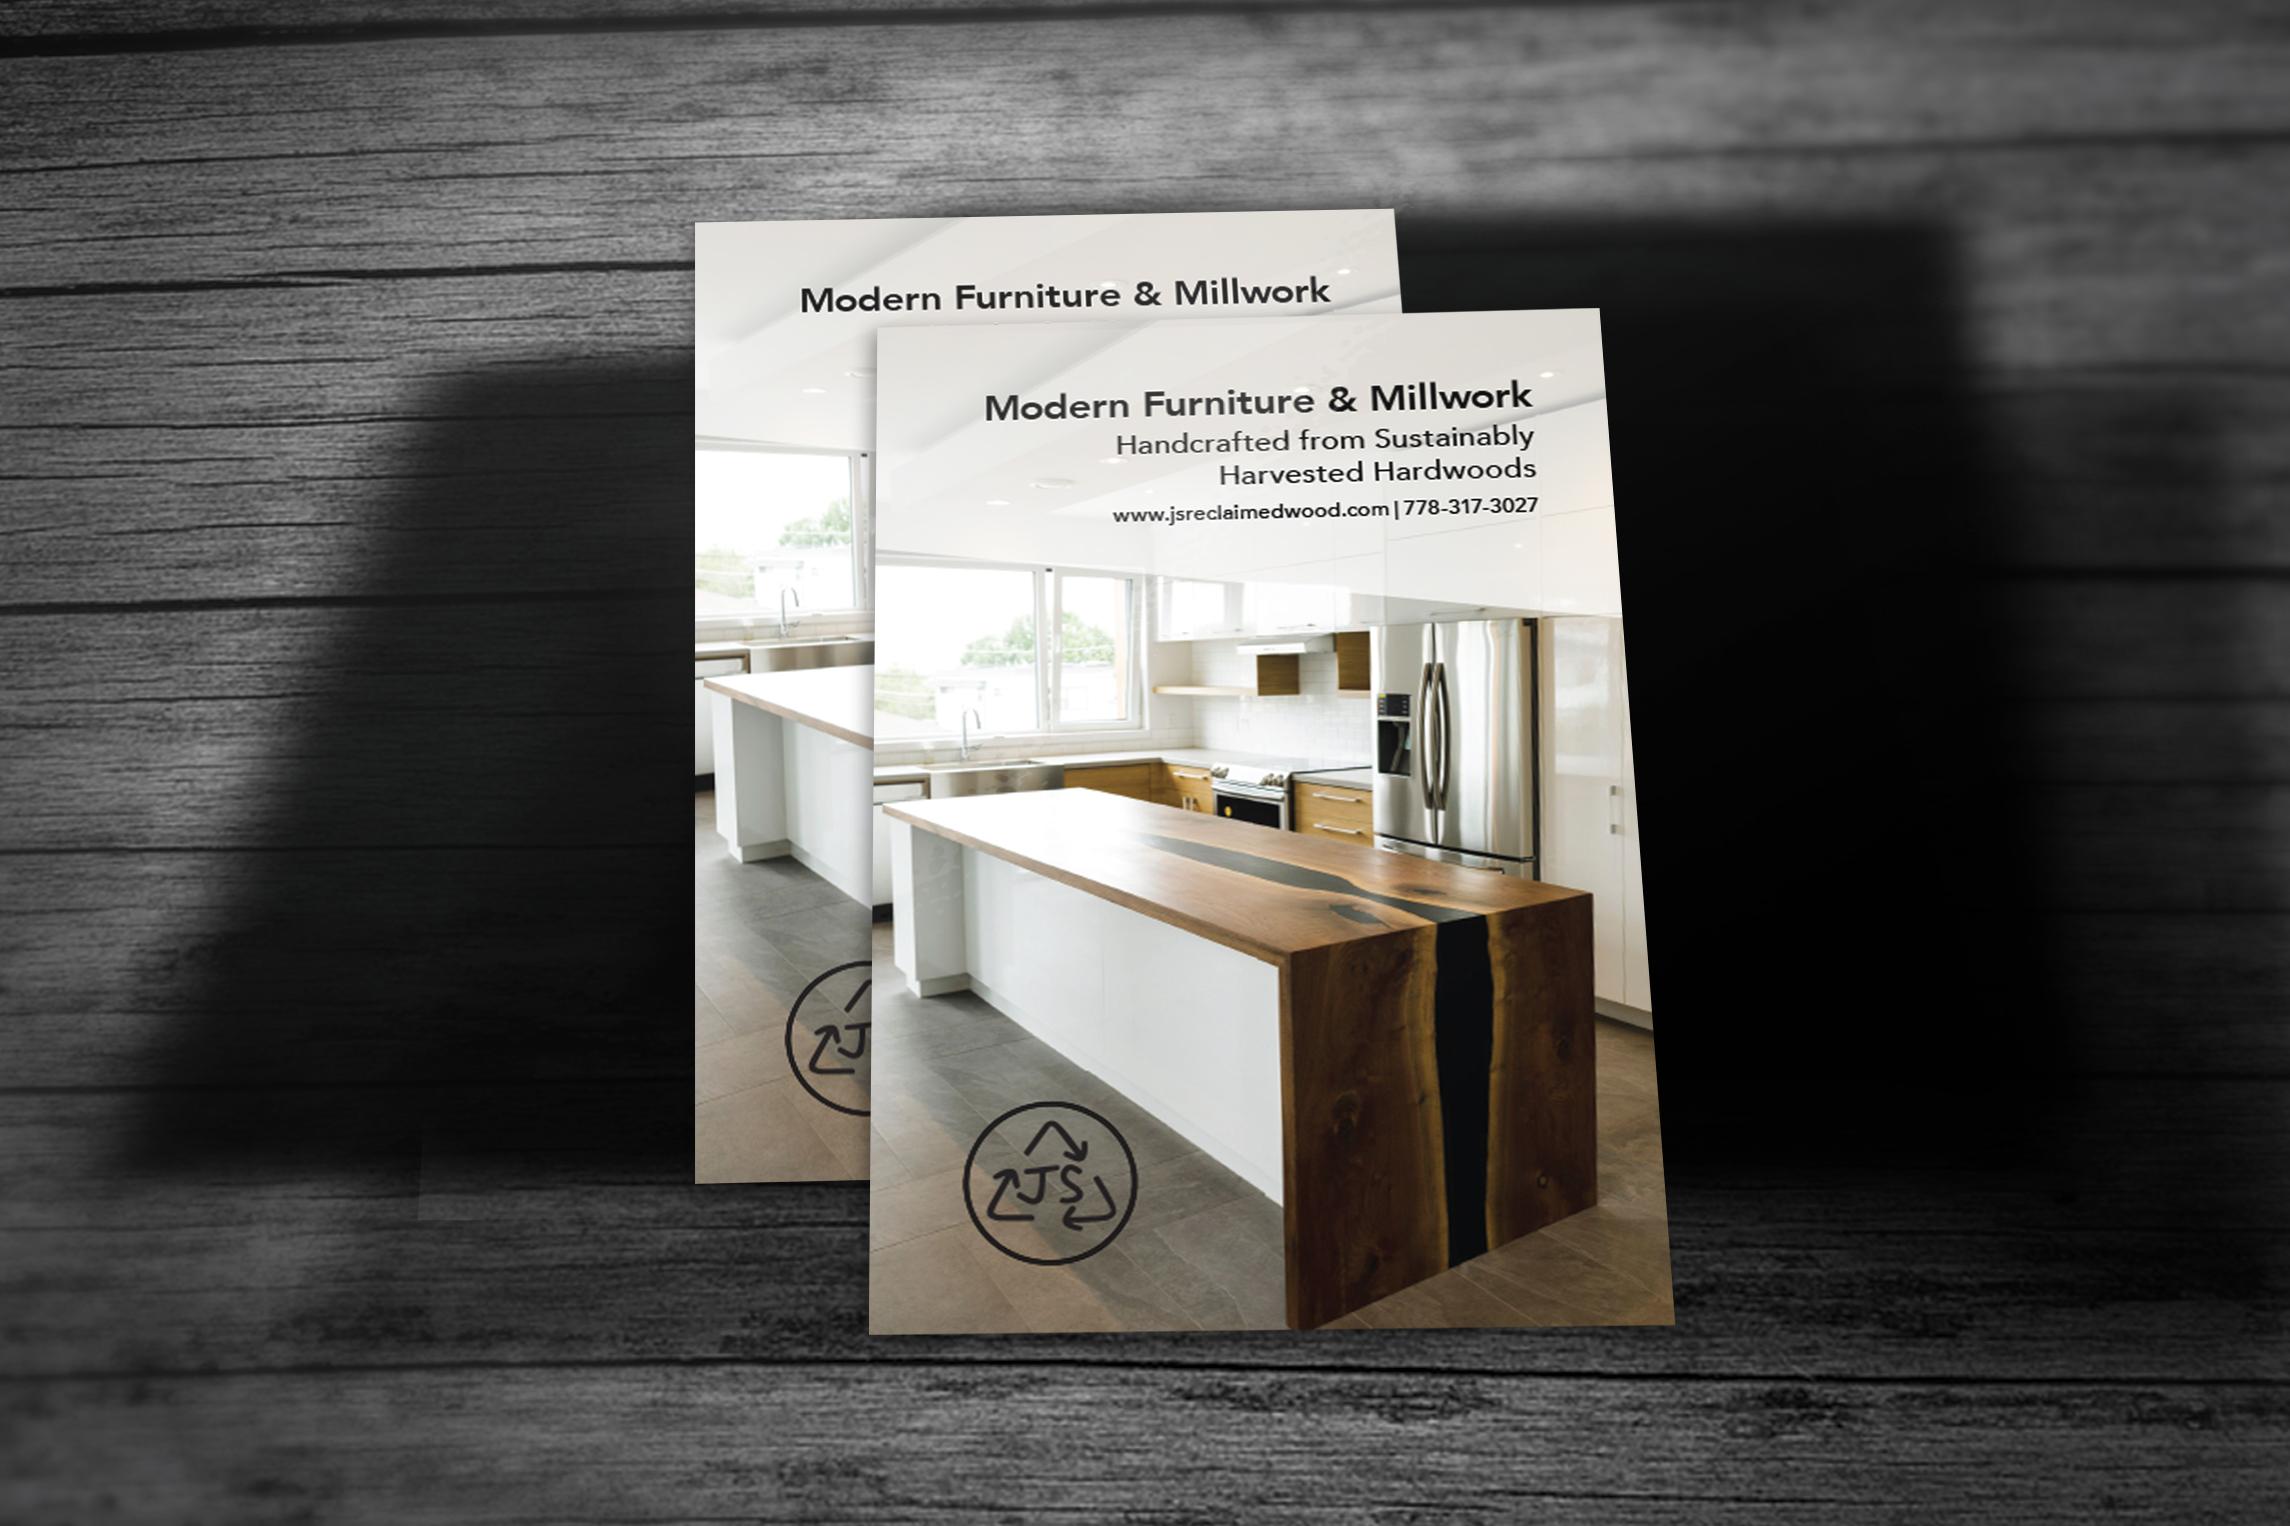 J&S Customer Furniture Postcard